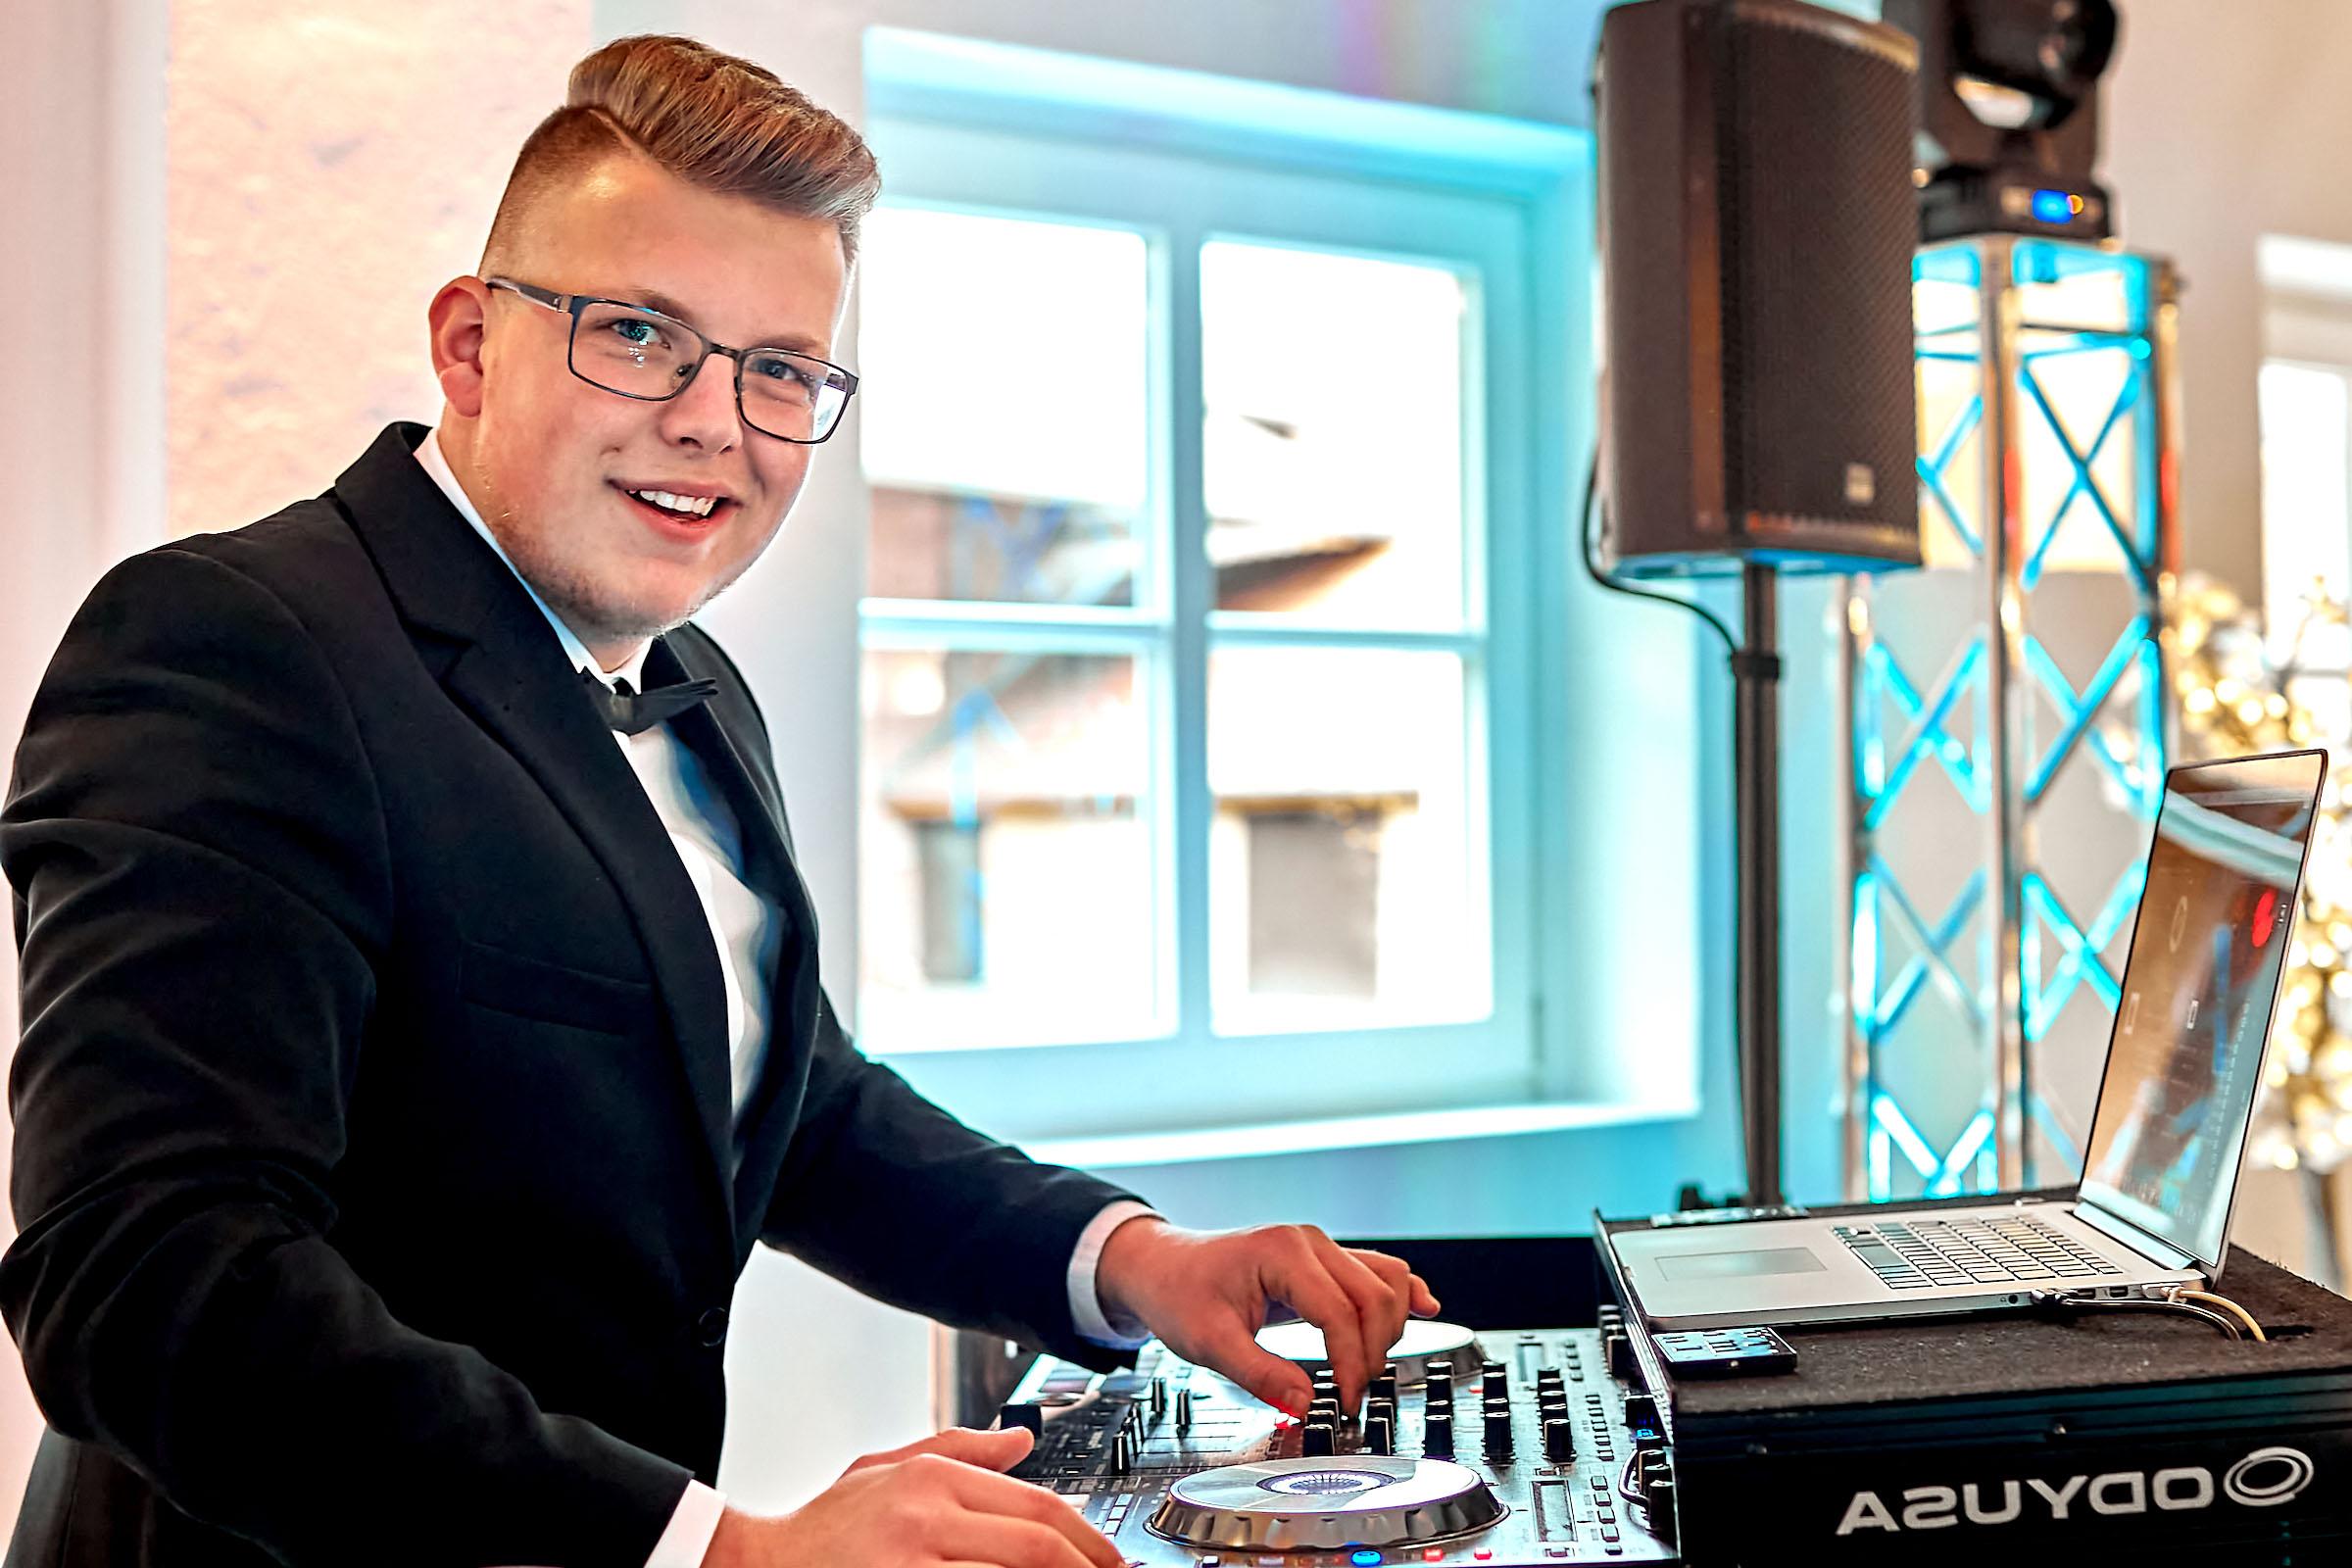 DJ | Hochzeit | Hannover | DJ | Hochzeit | Pascal | Seeger | DJ | Messe | DJ | Firmenfeier | DJ | Firmenevent | DJ | Geburtstag | DJ | Service | DJ | Agentur | DJ | Braunschweig | Buchen | Anfragen | Lehmann | Eventservice